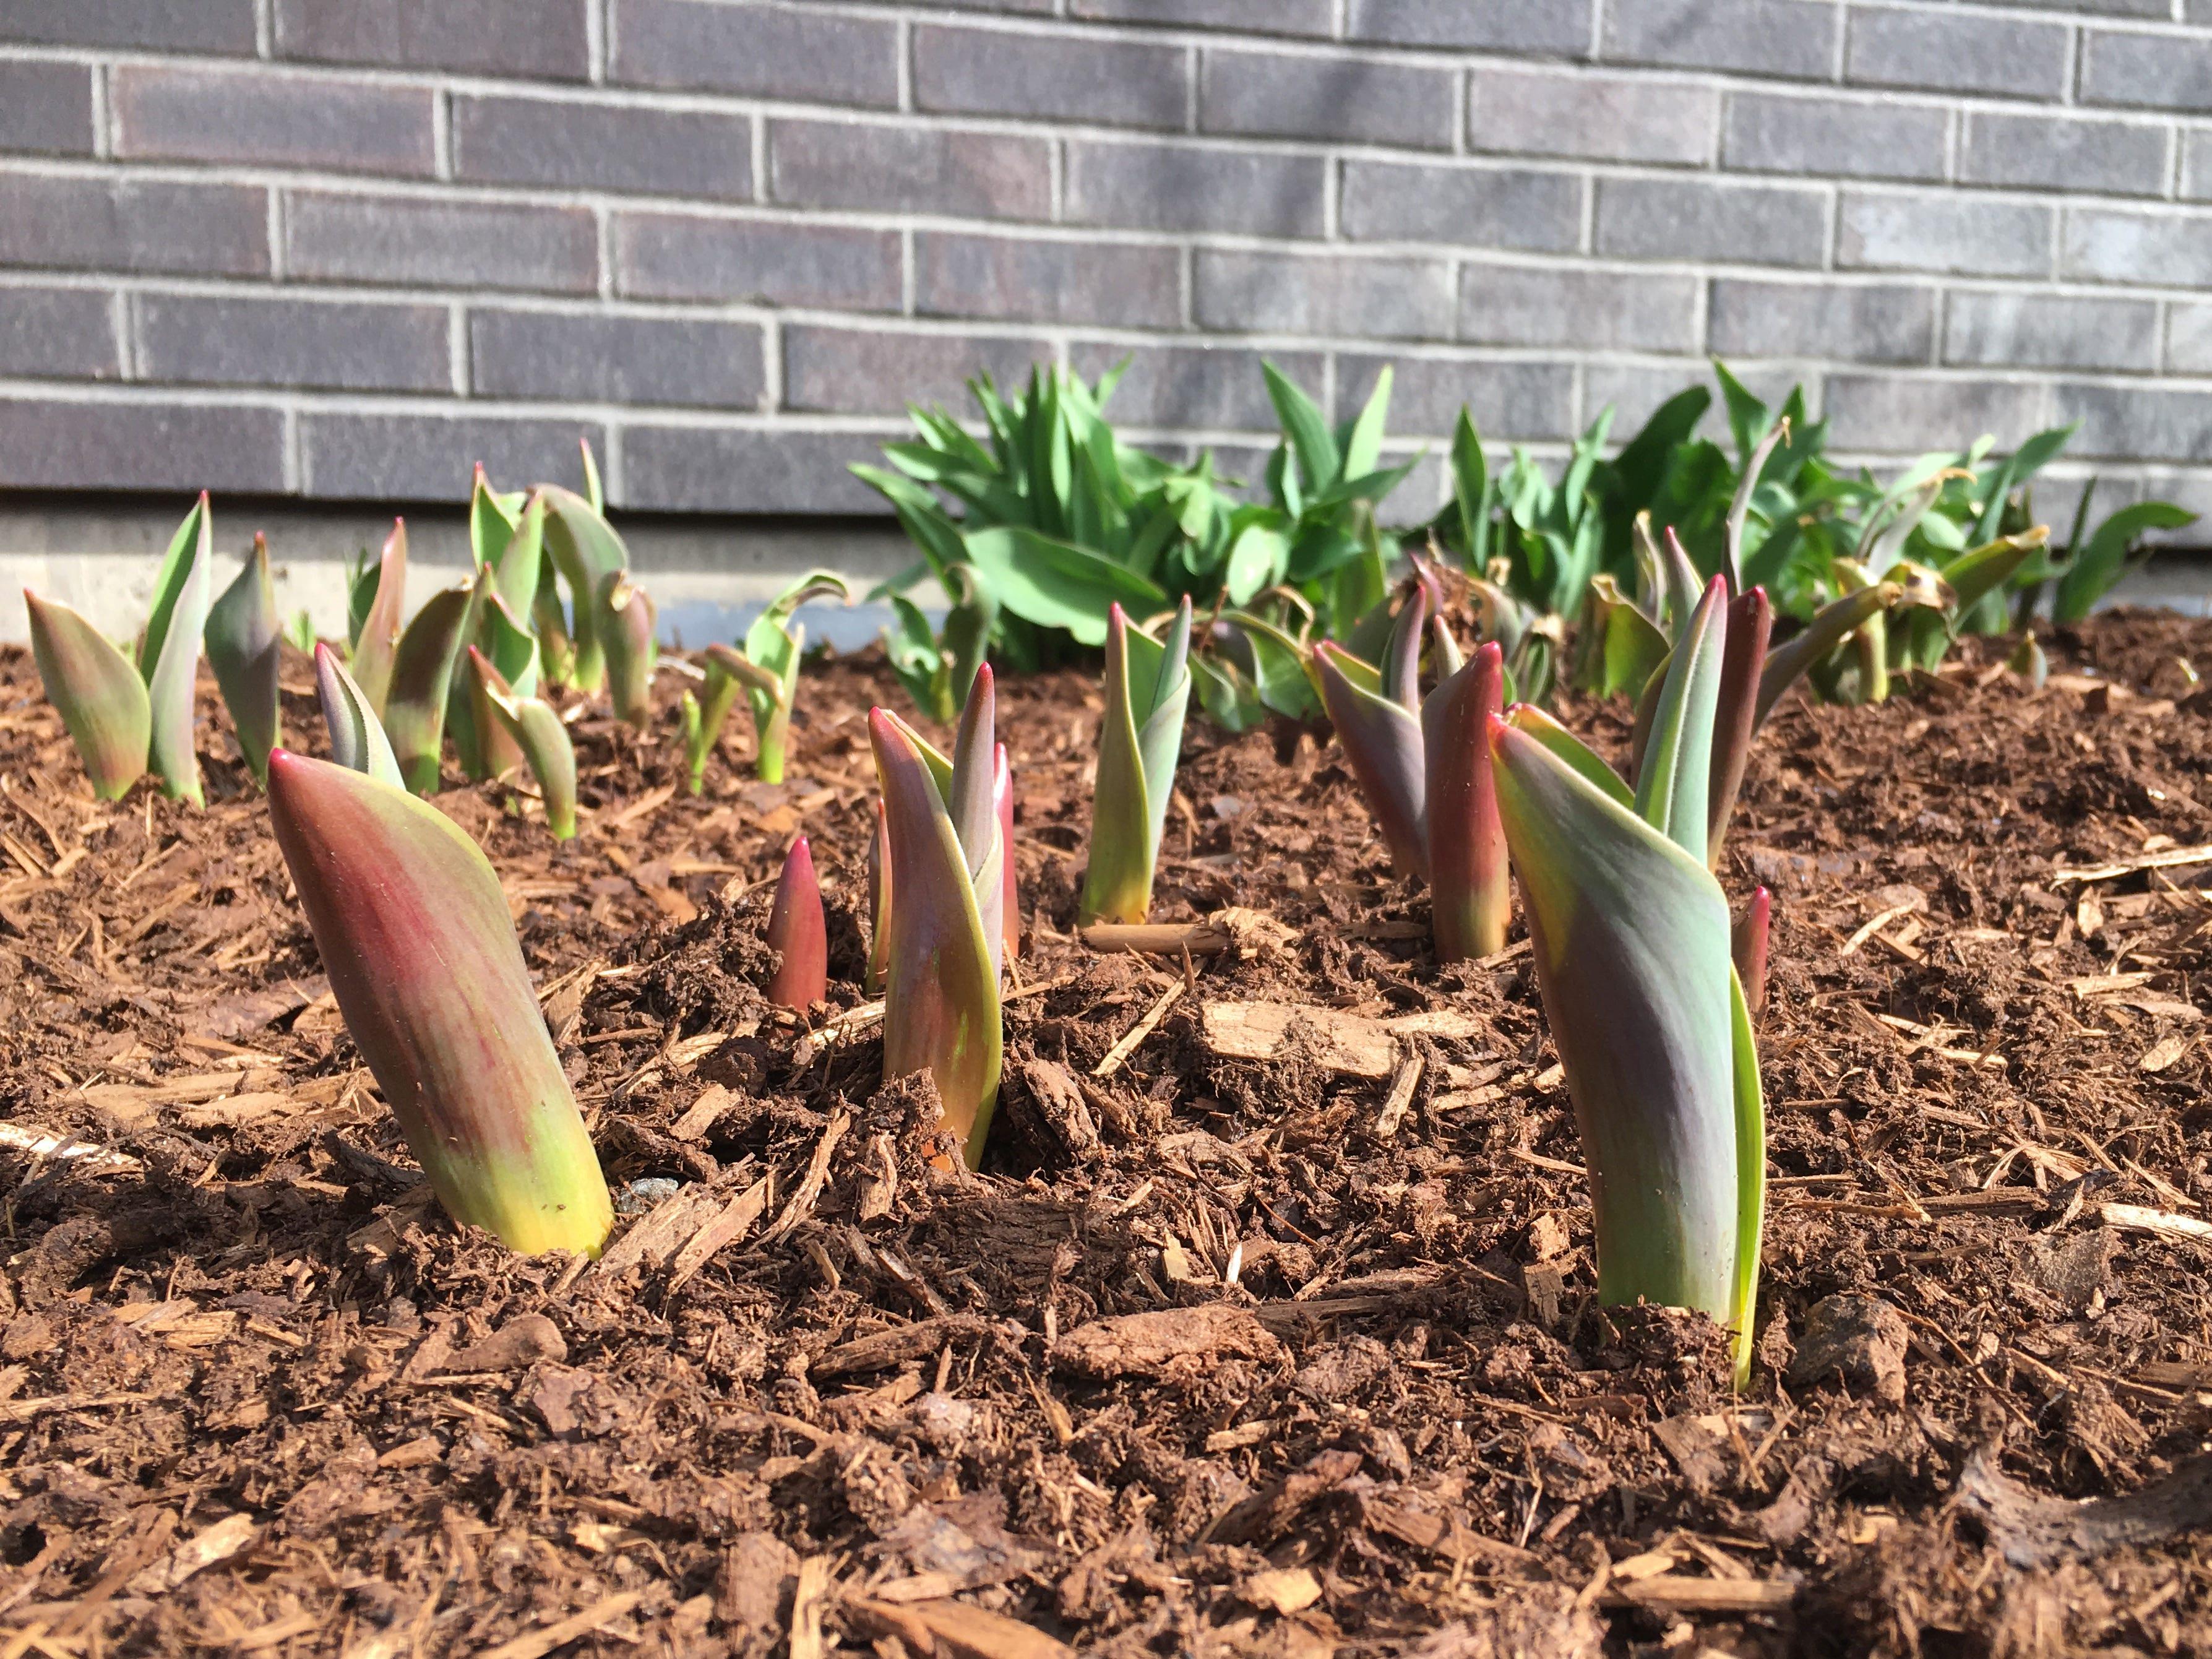 Early-stage tulips extend skyward on King Street in Burlington on Sunday, April 14, 2019.